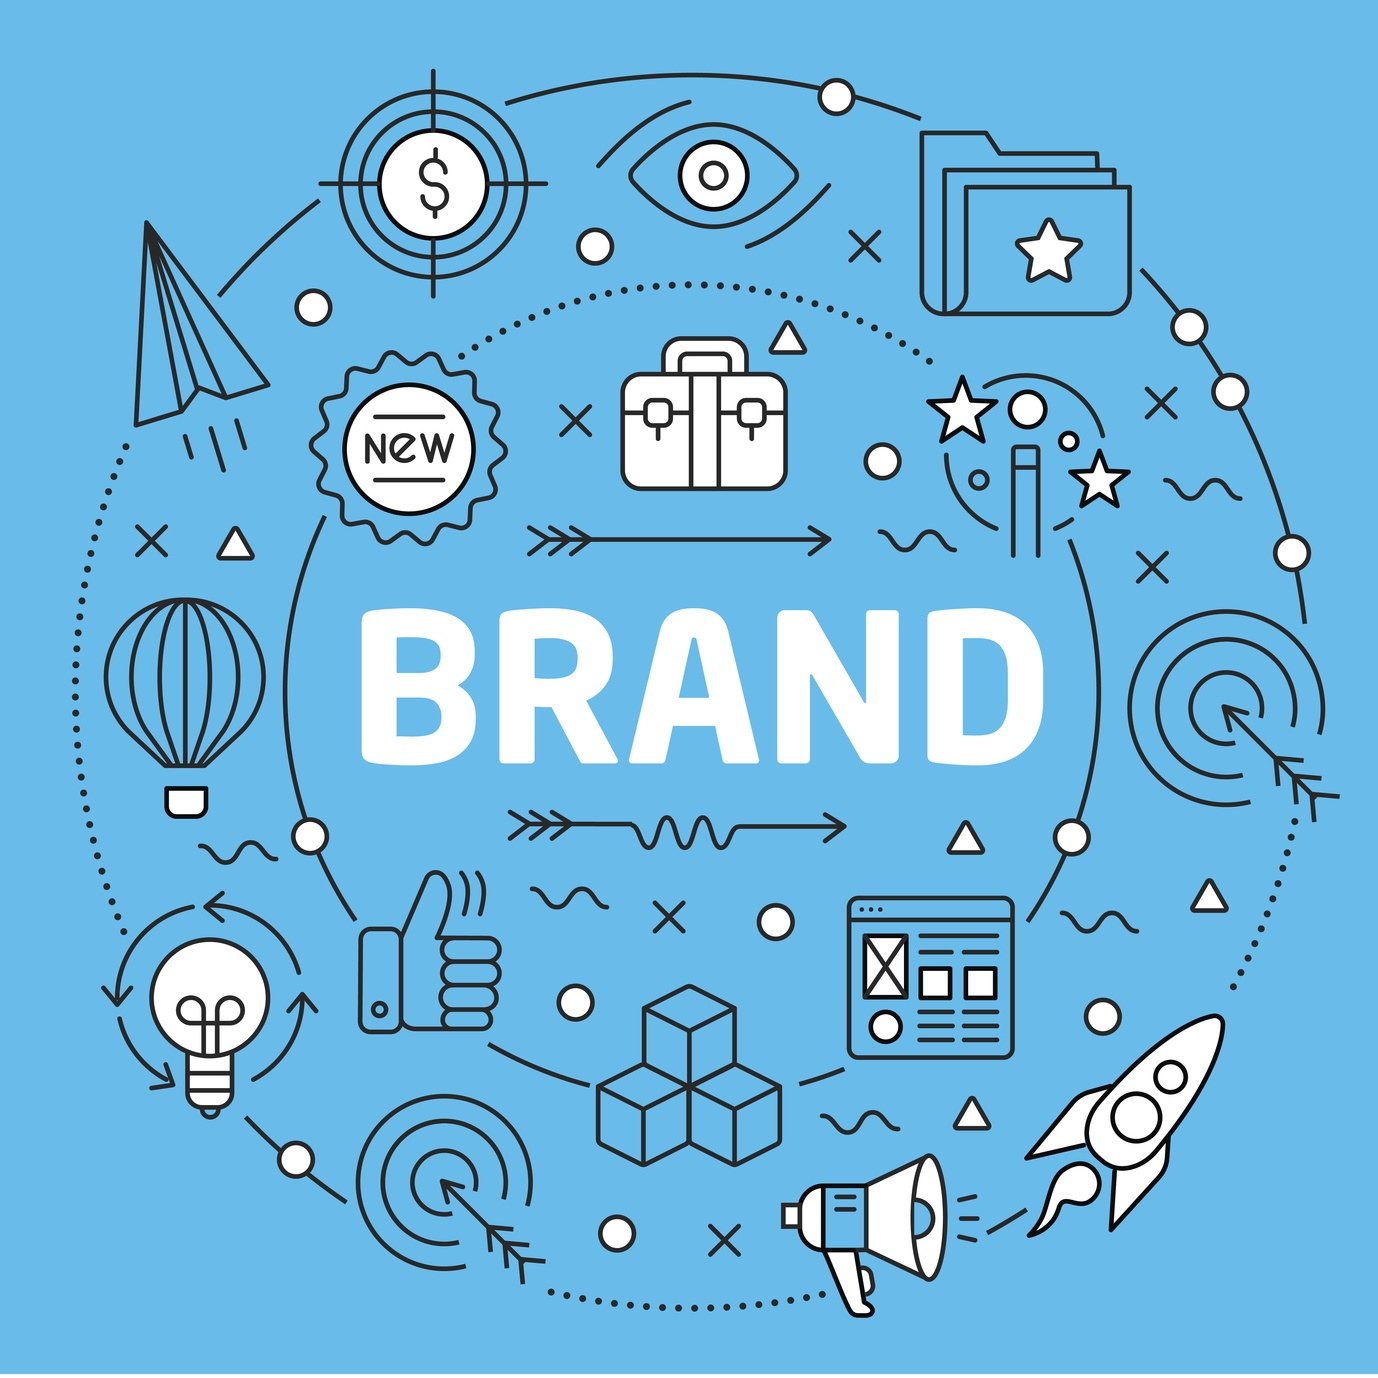 6 Branding (and Rebranding) Mistakes to Avoid